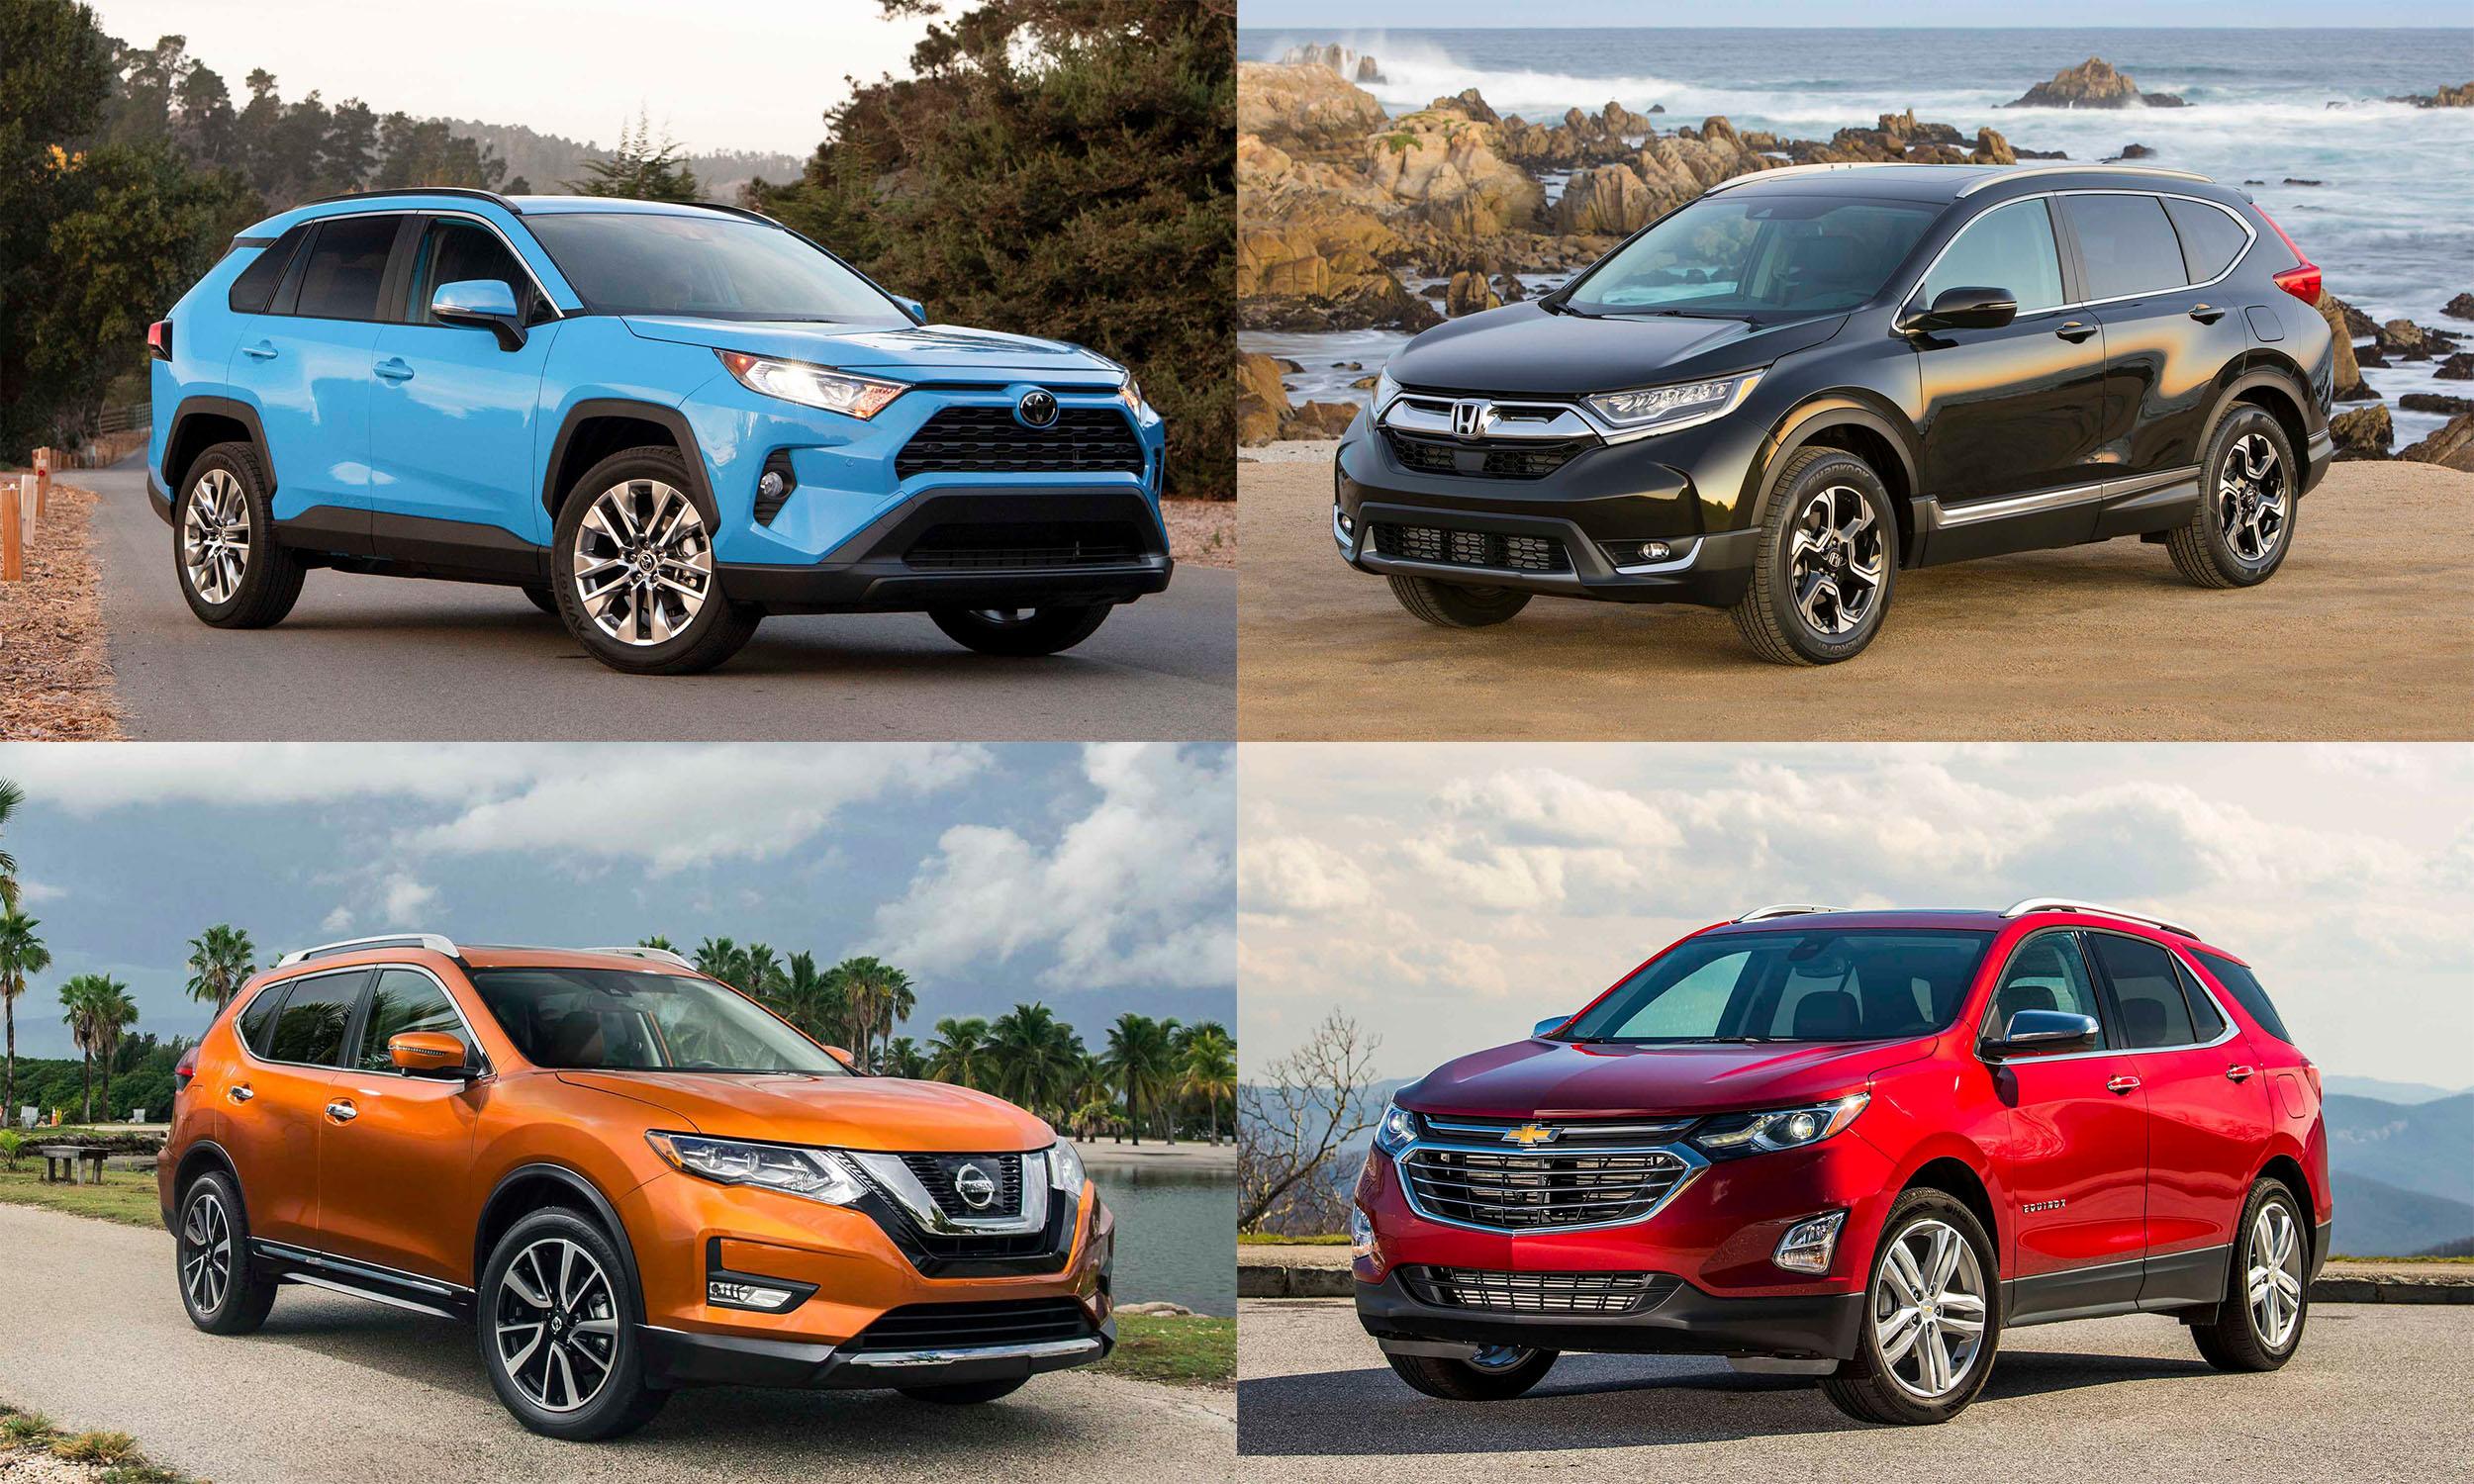 © Toyota Motor Sales; American Honda Motor Company; General Motors; Nissan North America